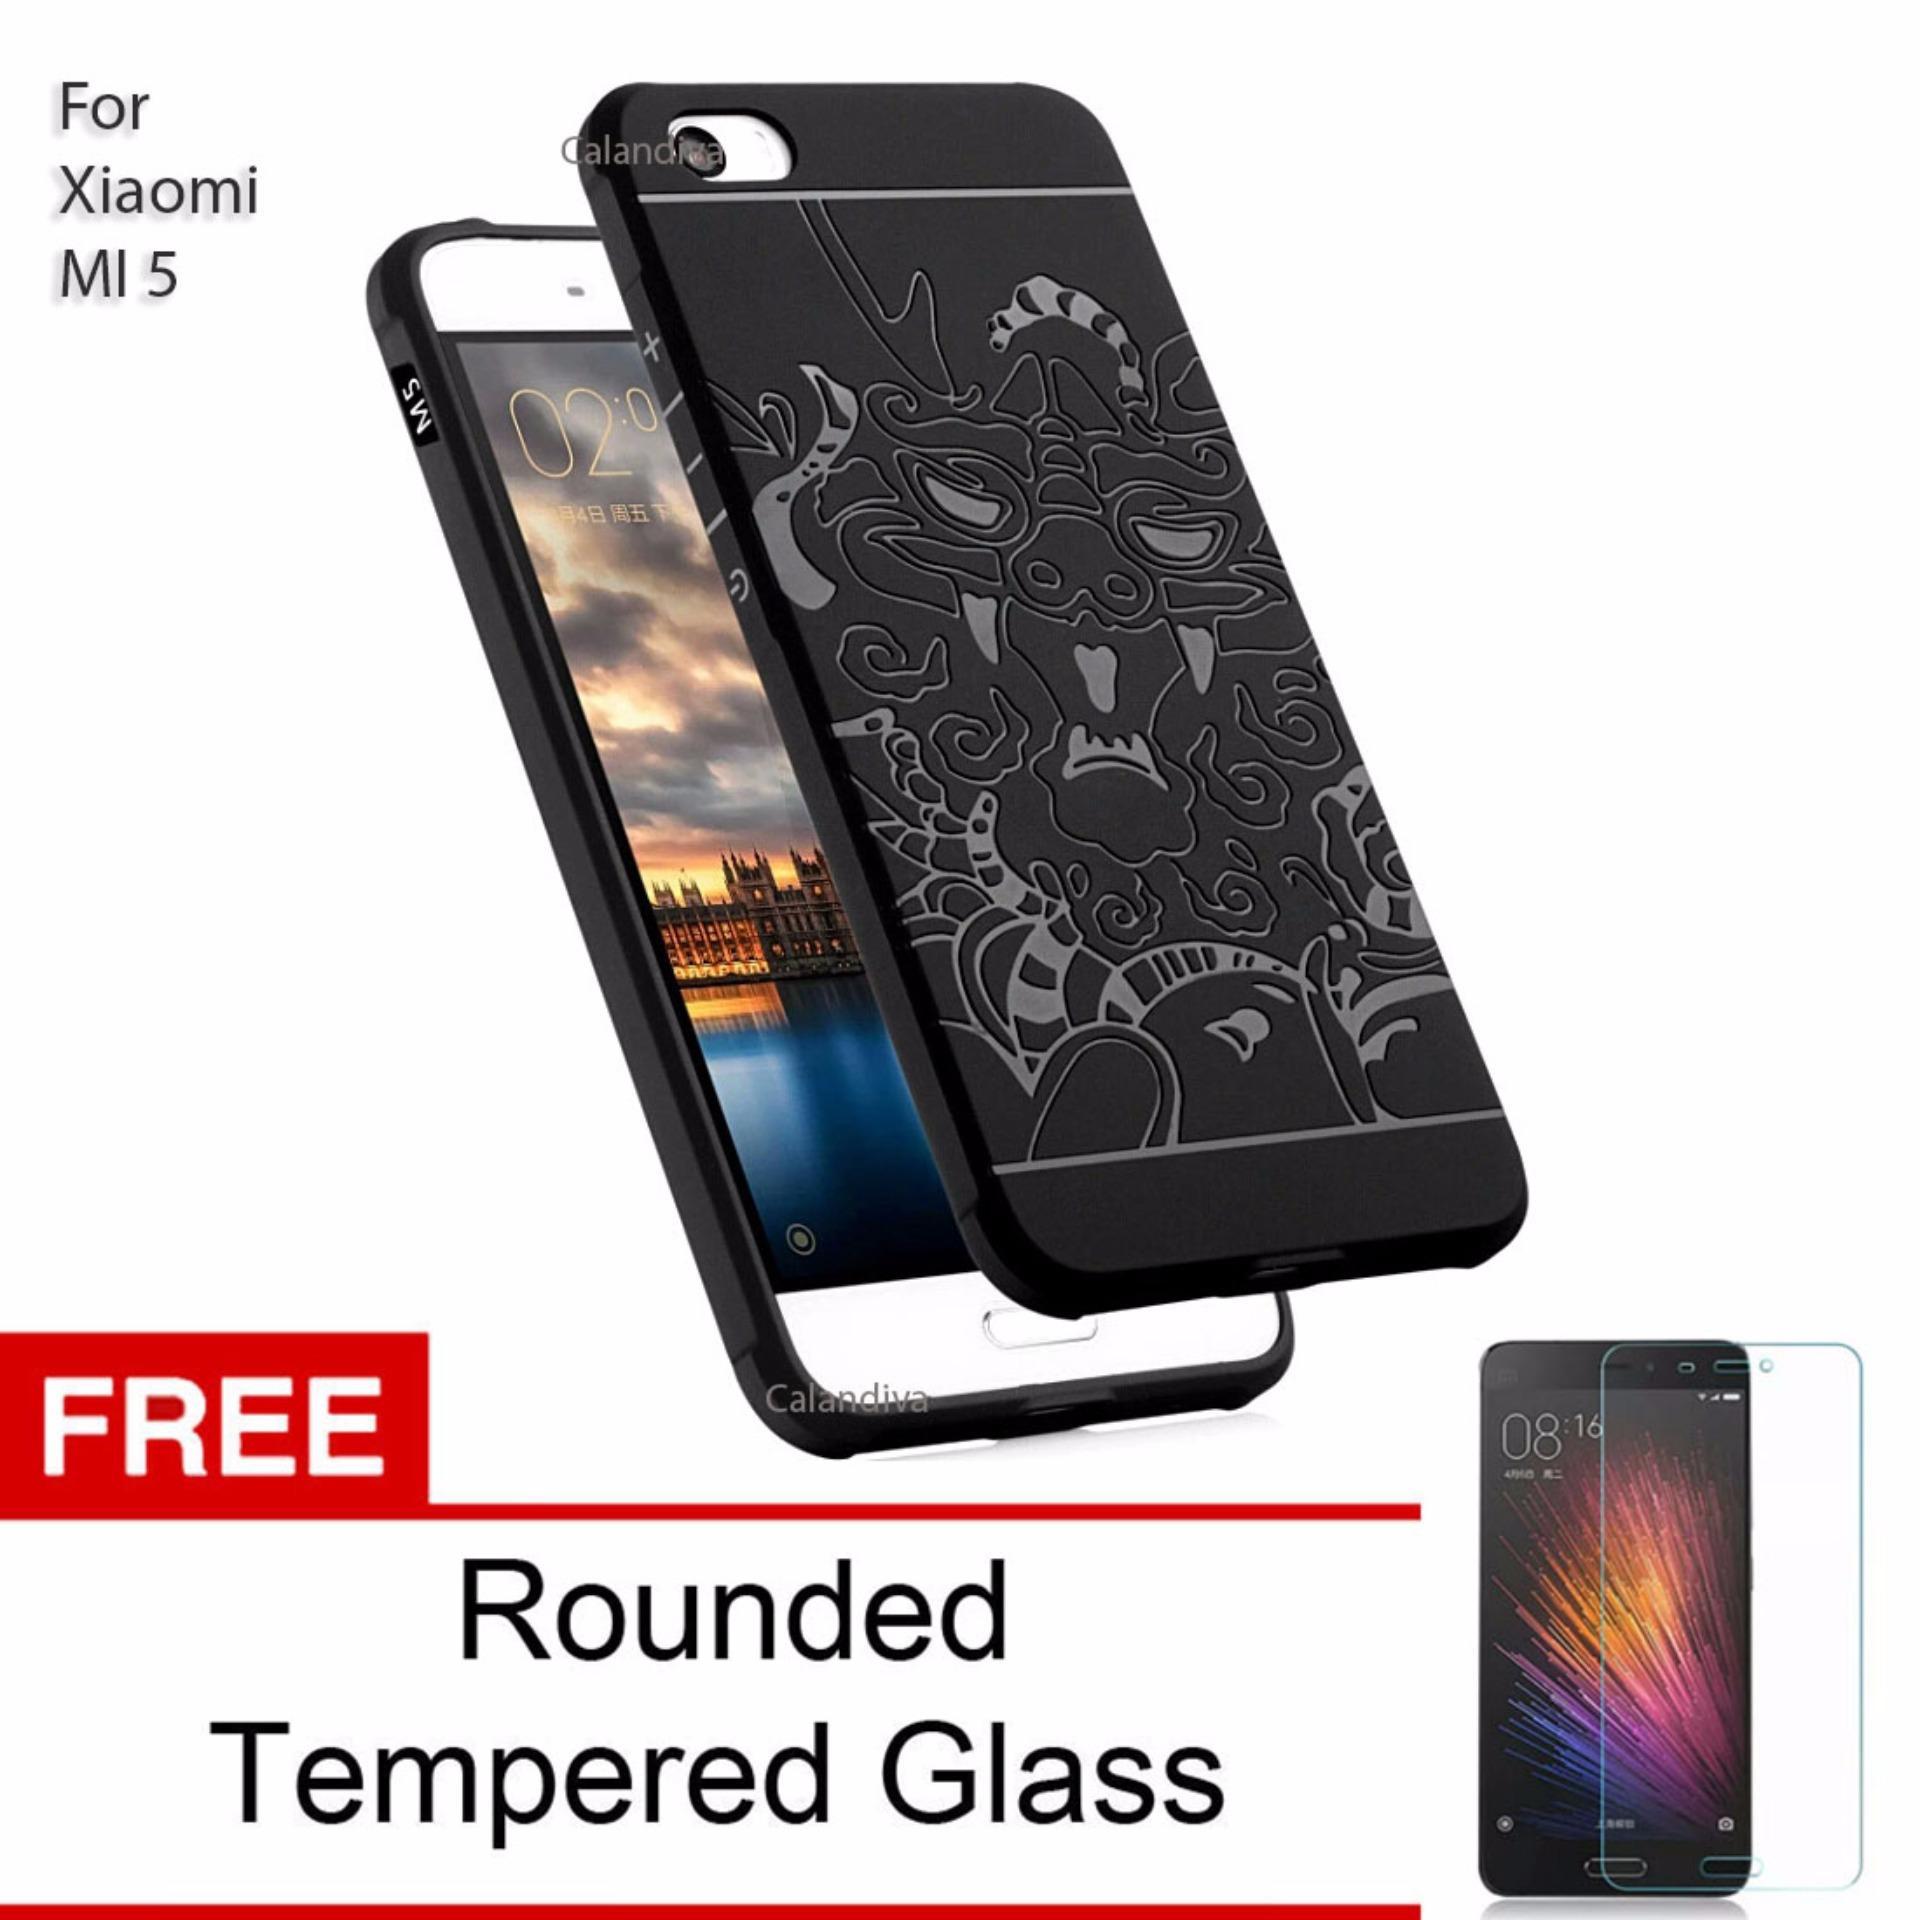 Penjualan Calandiva Dragon Shockproof Hybrid Case untuk Xiaomi Mi 5 / Mi 5 Pro - Hitam + Gratis Tempered Glass terbaik murah - Hanya Rp46.008